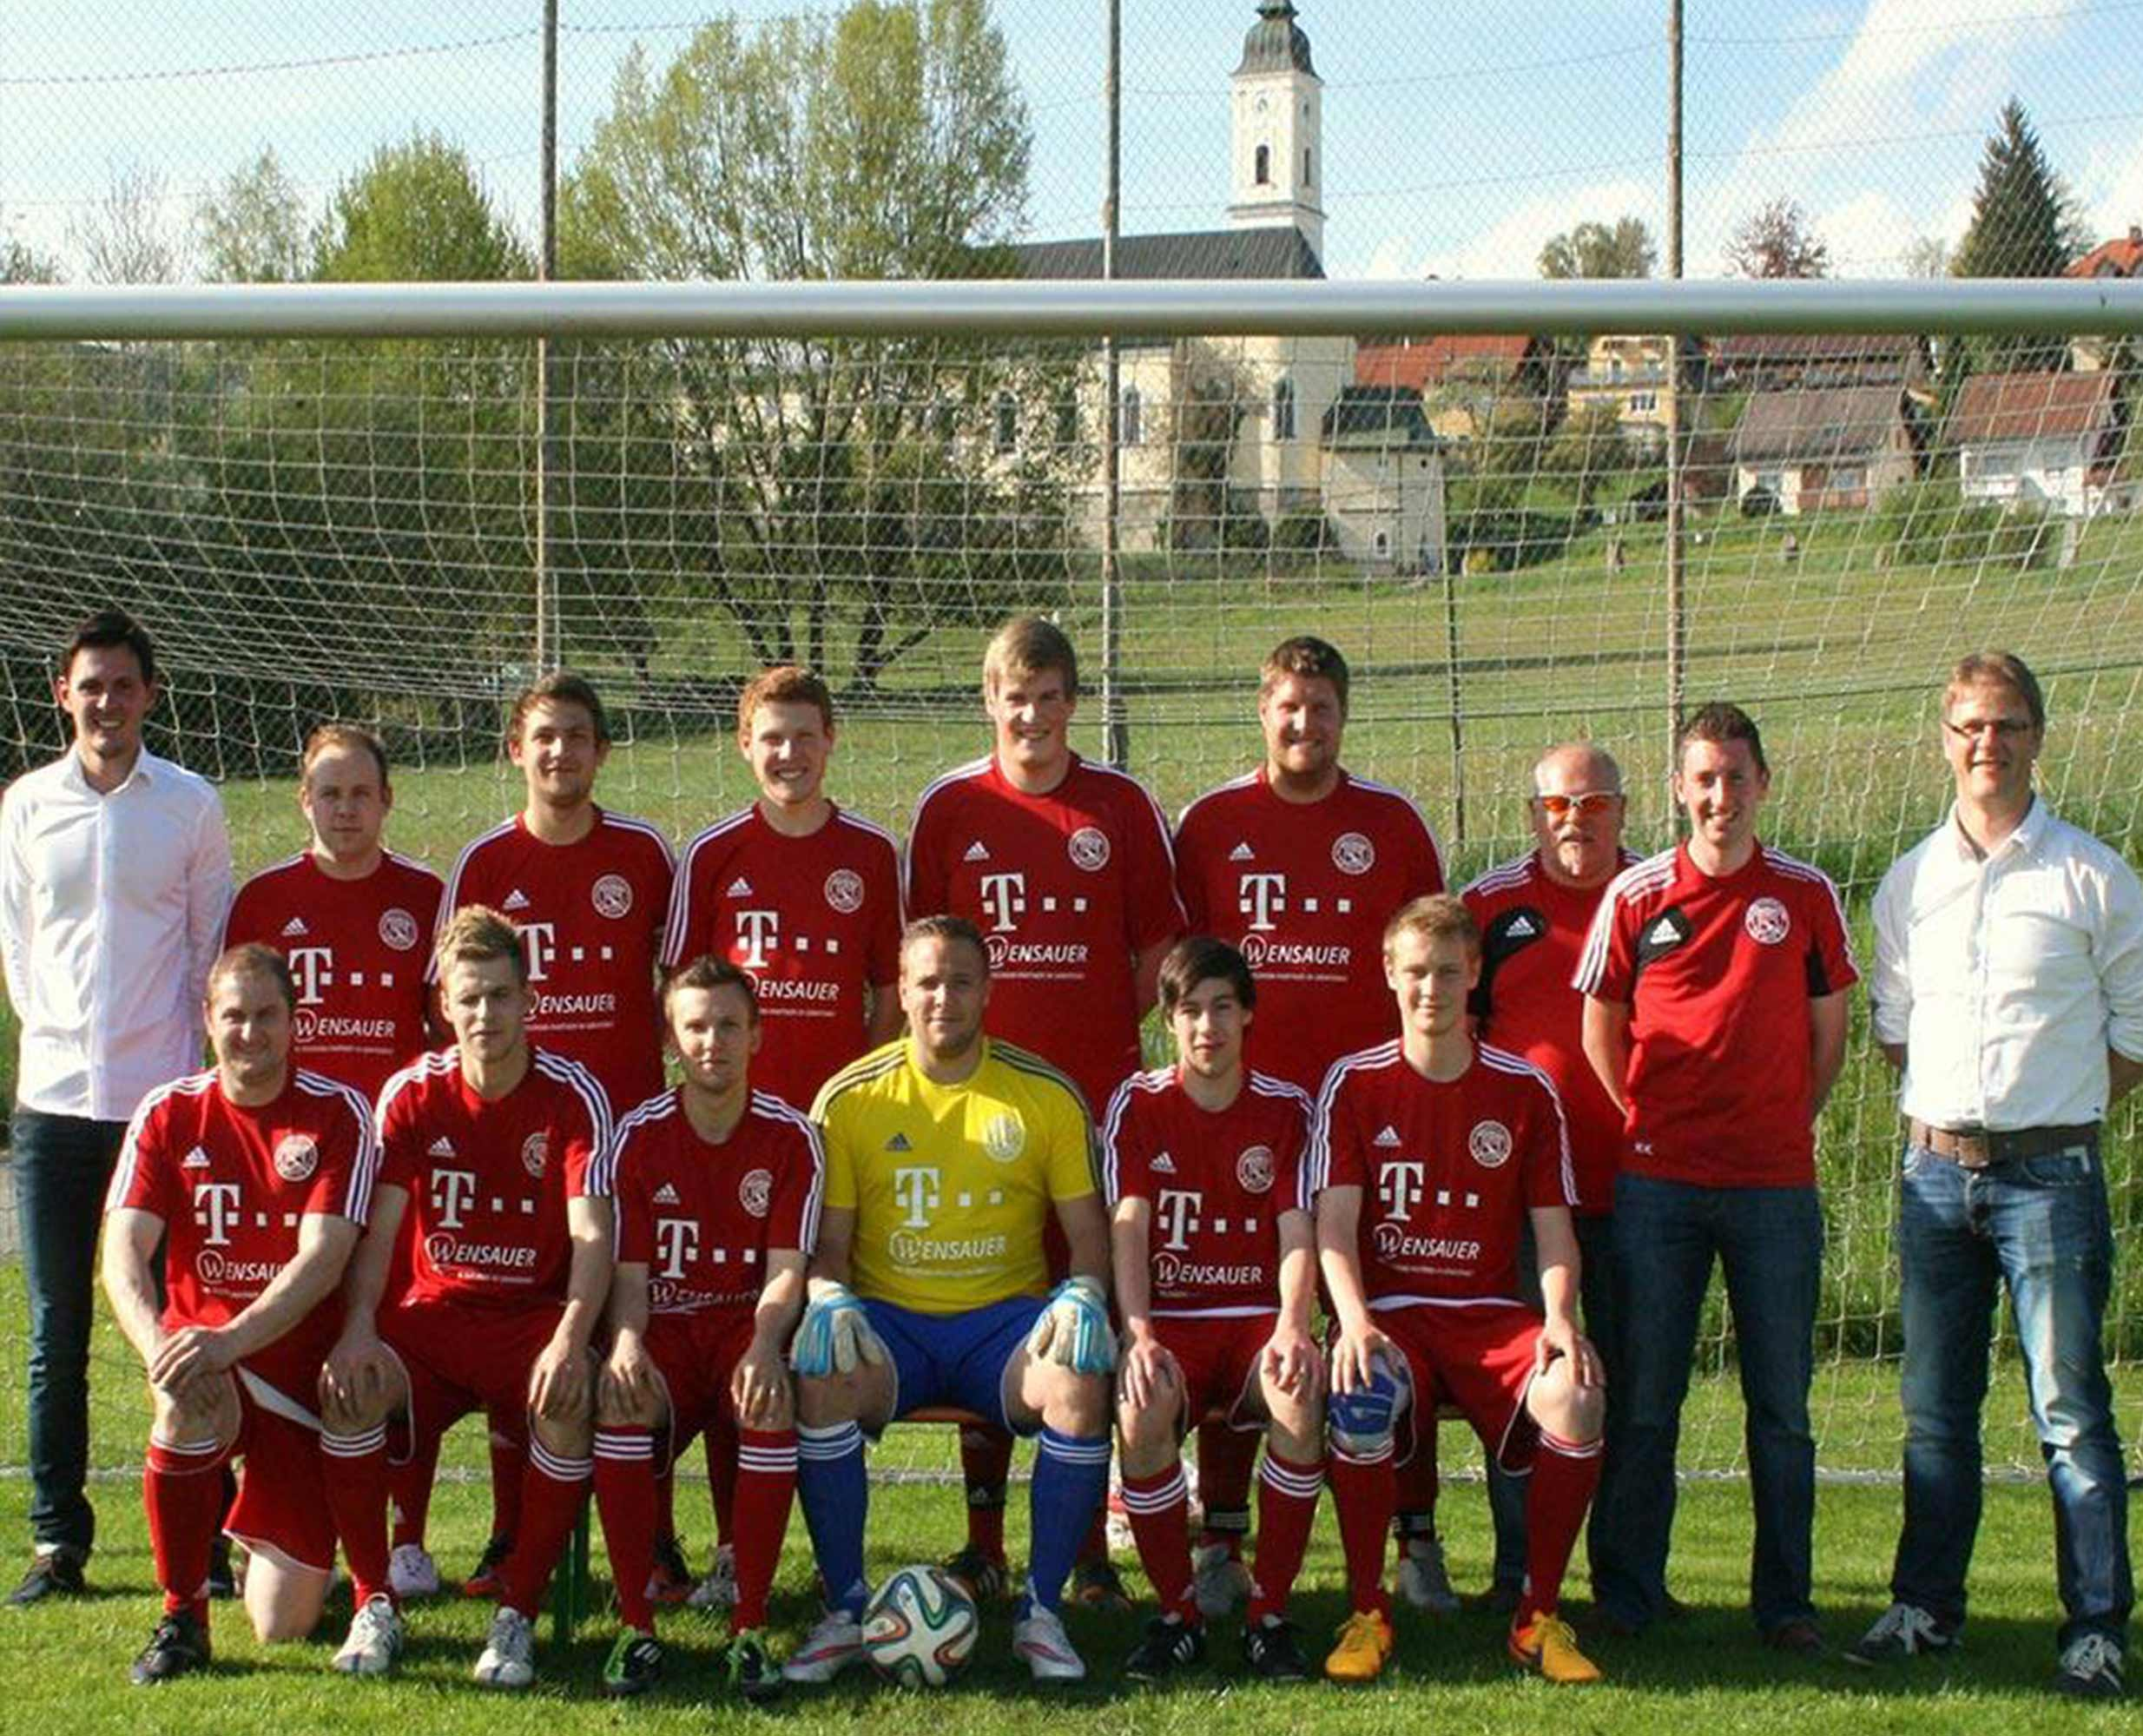 Sponsoring DJK-SV St. Oswald | Wensauer Com-Systeme GmbH